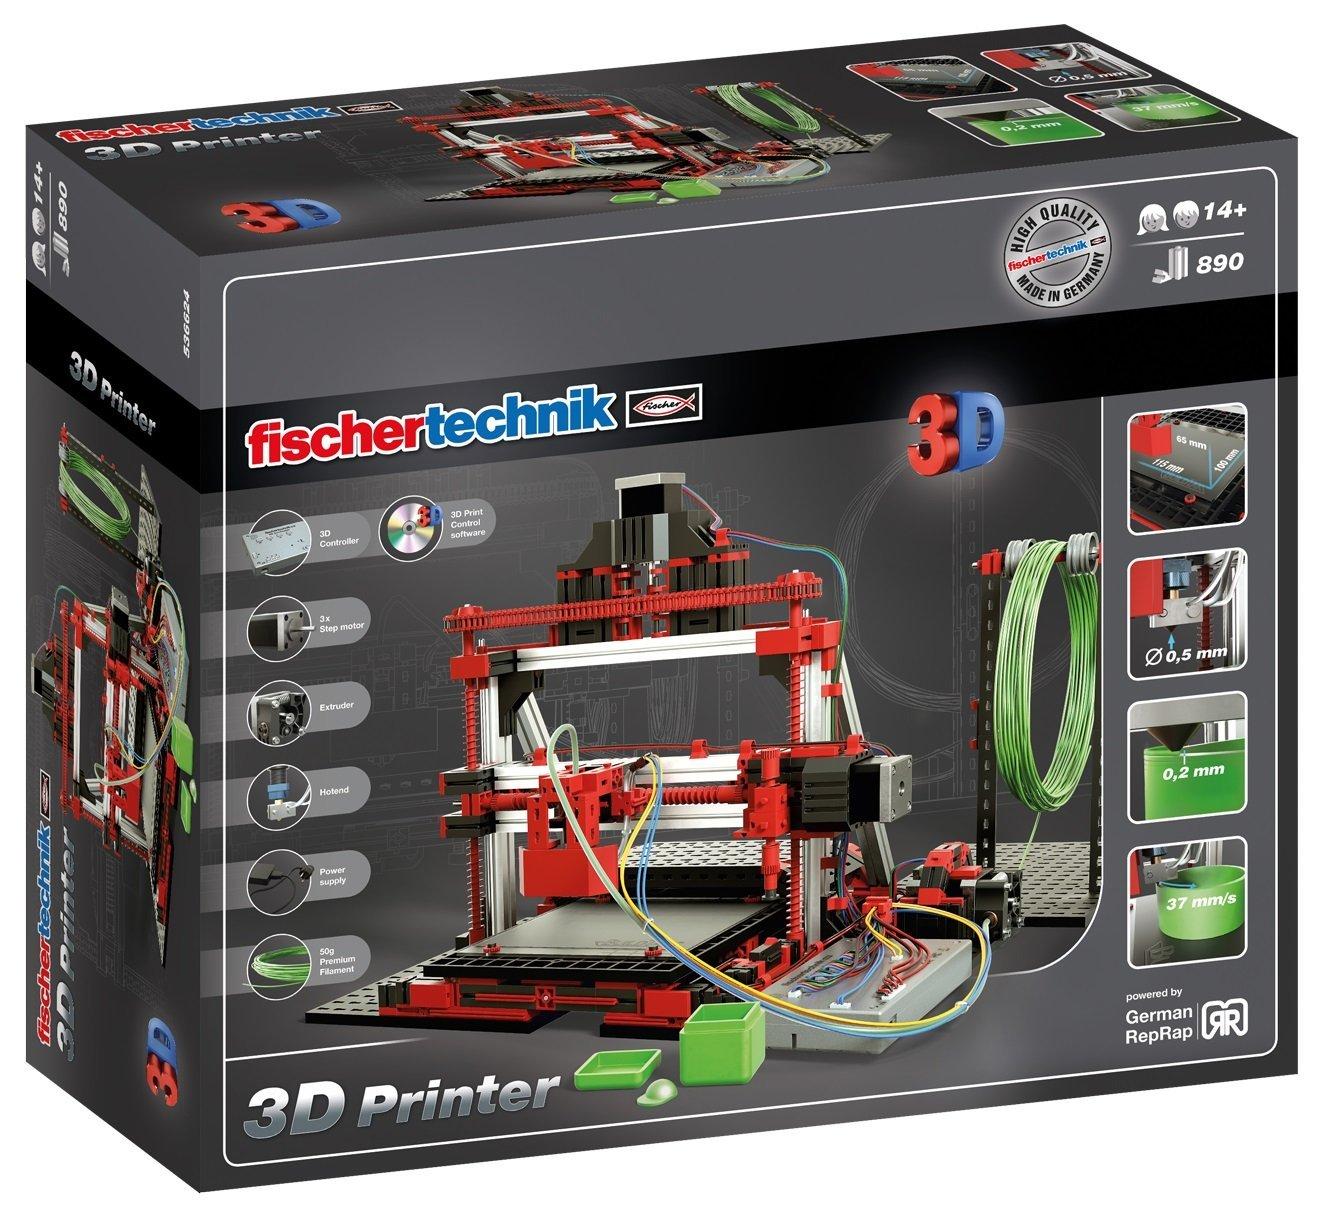 Impresora 3D Fischertechnik Education en RO-BOTICA